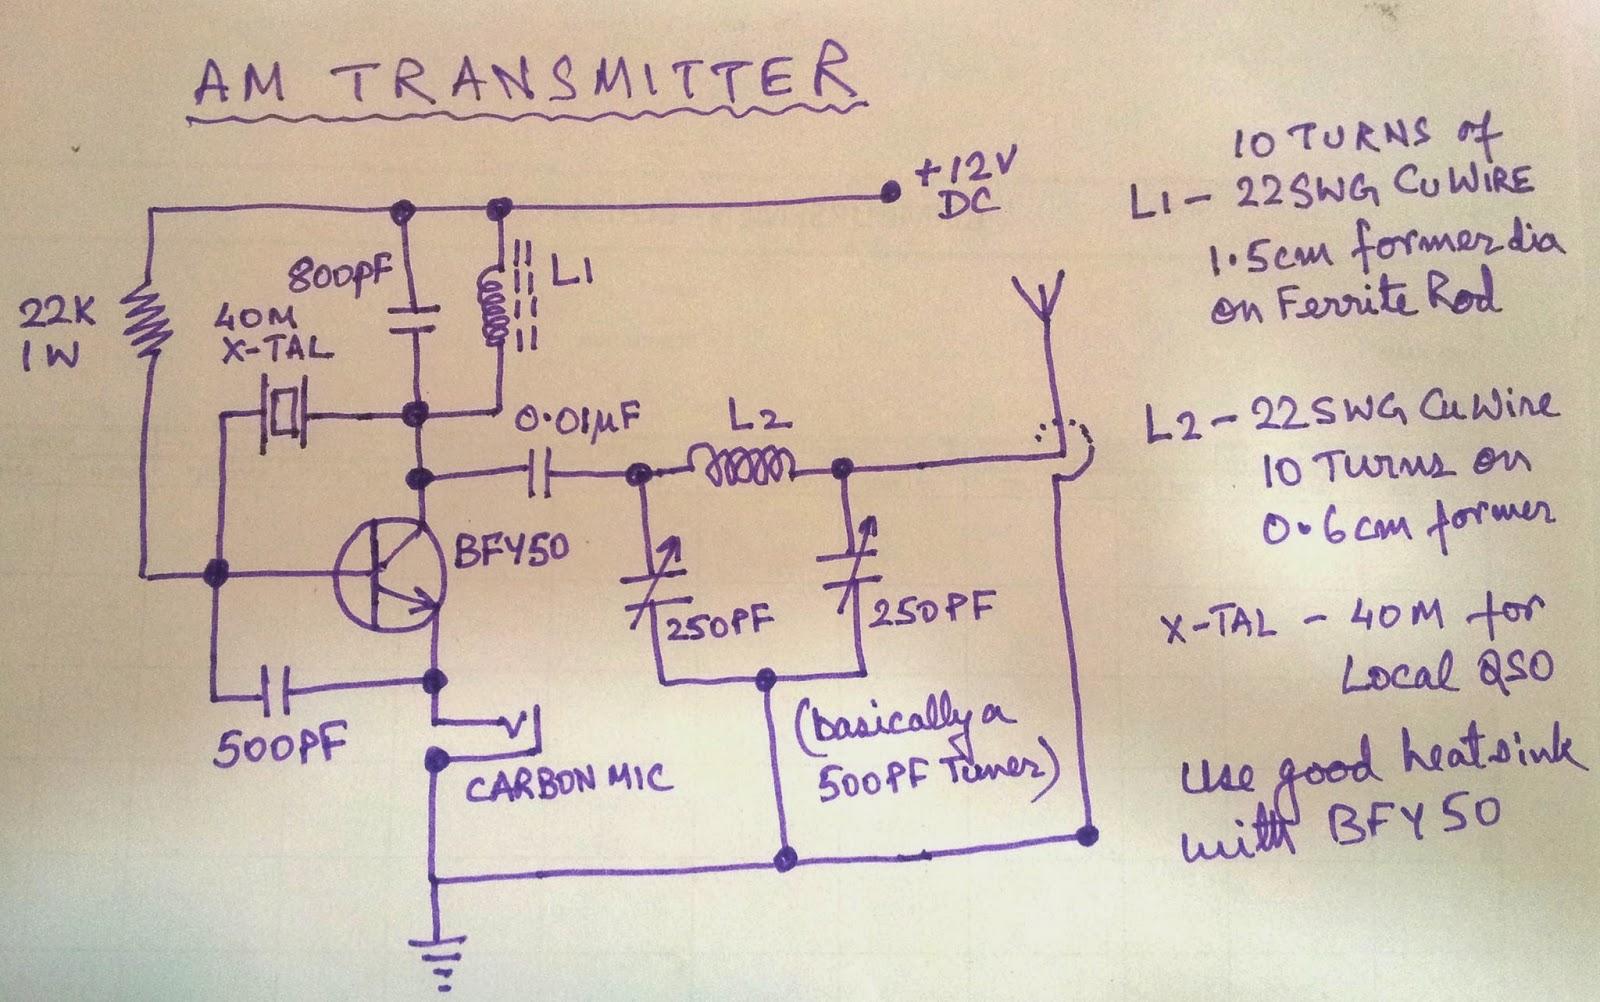 One Transistor Transmitter Fm Circuit Page 2 Rf Circuits Nextgr Vu Uuu 1600x1002